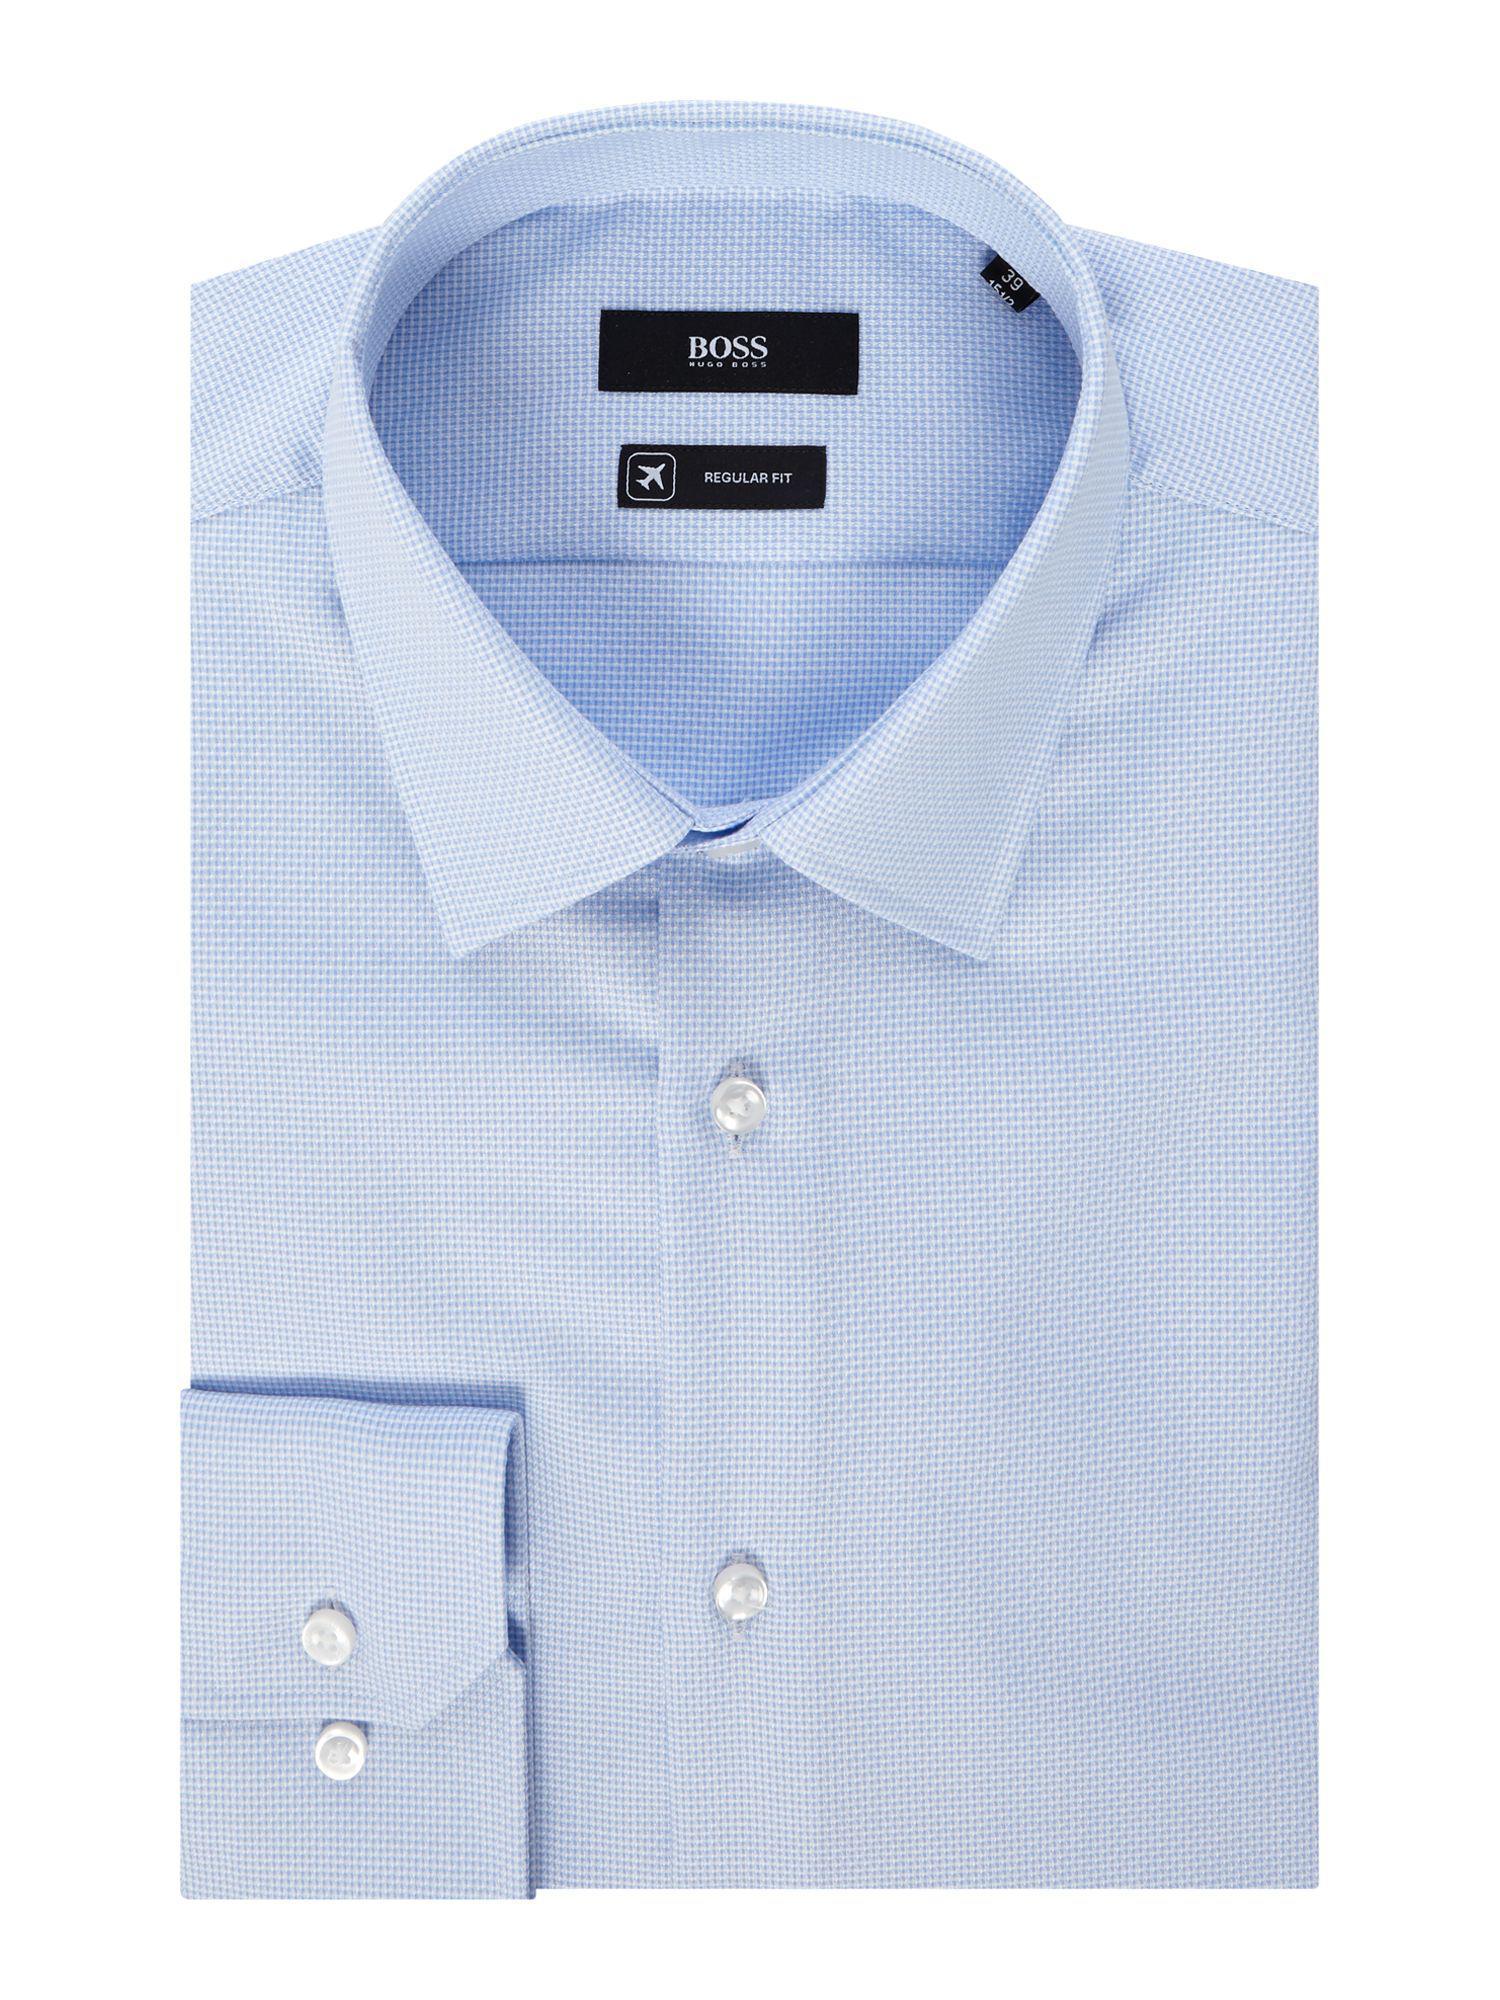 c151320a1 Boss Men's Enzo Regular Fit Micro Texture Geo Print Shirt in Blue ...